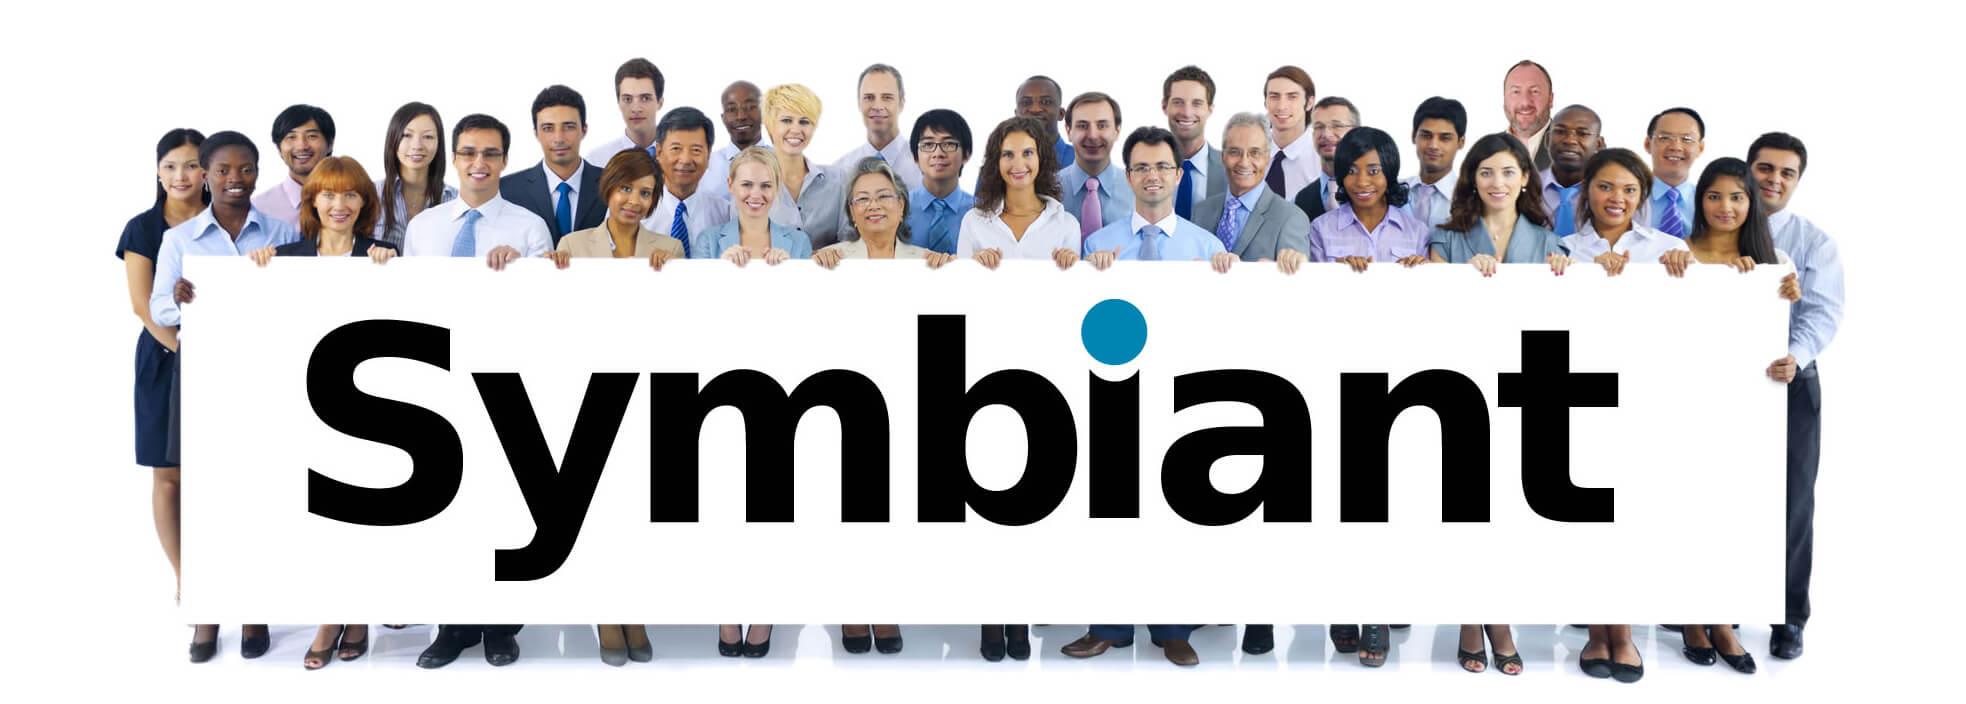 Team Symbiant